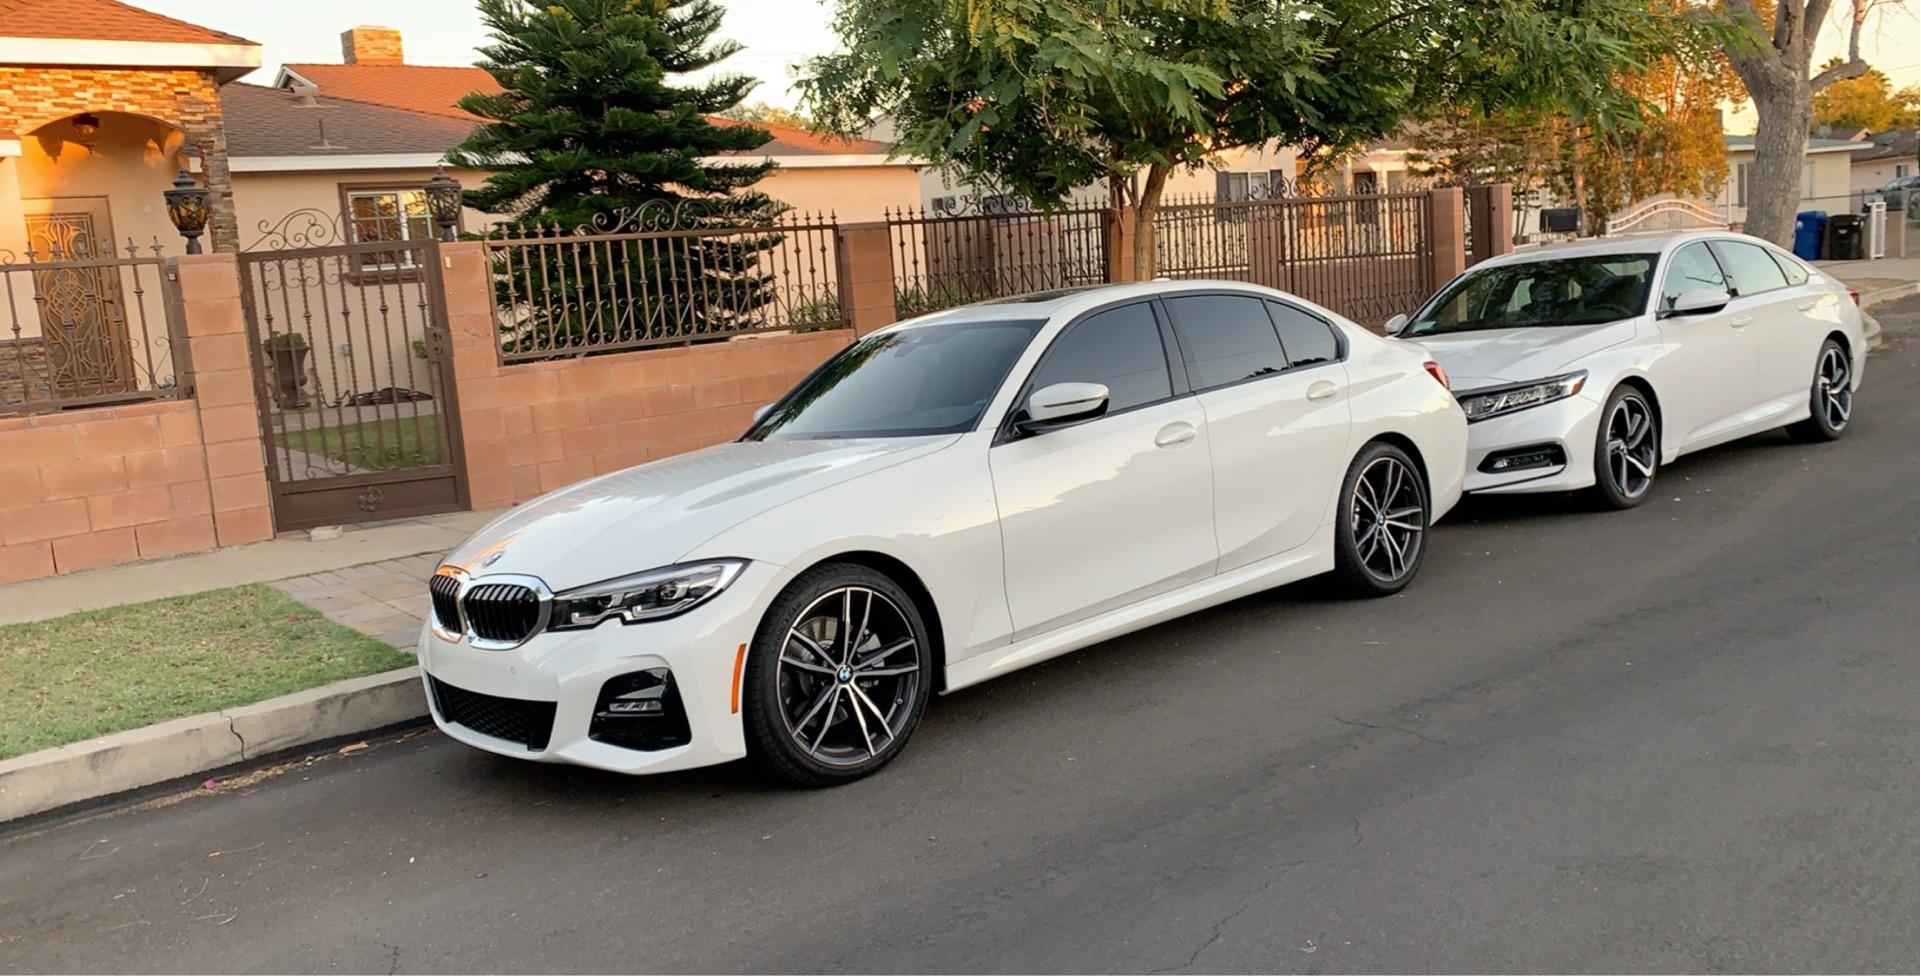 BMW 3 Series 2019 Lease Deals in Glendale, California ...